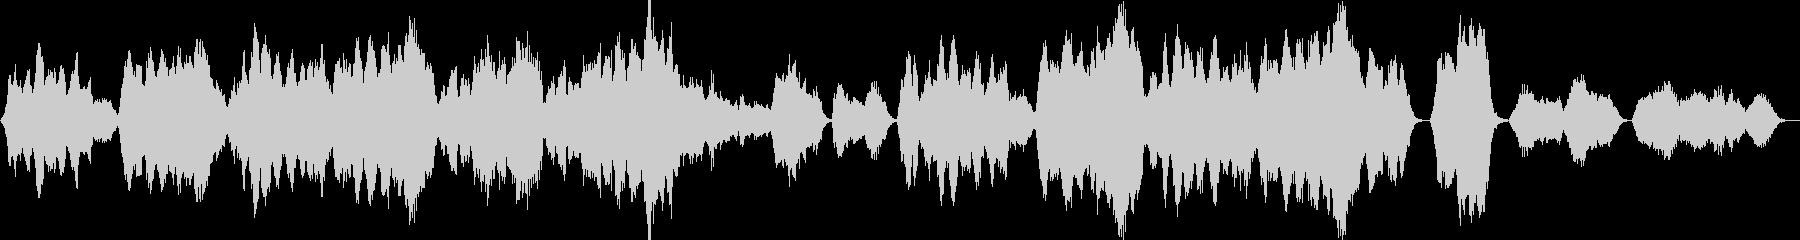 Andante Cantabile's unreproduced waveform